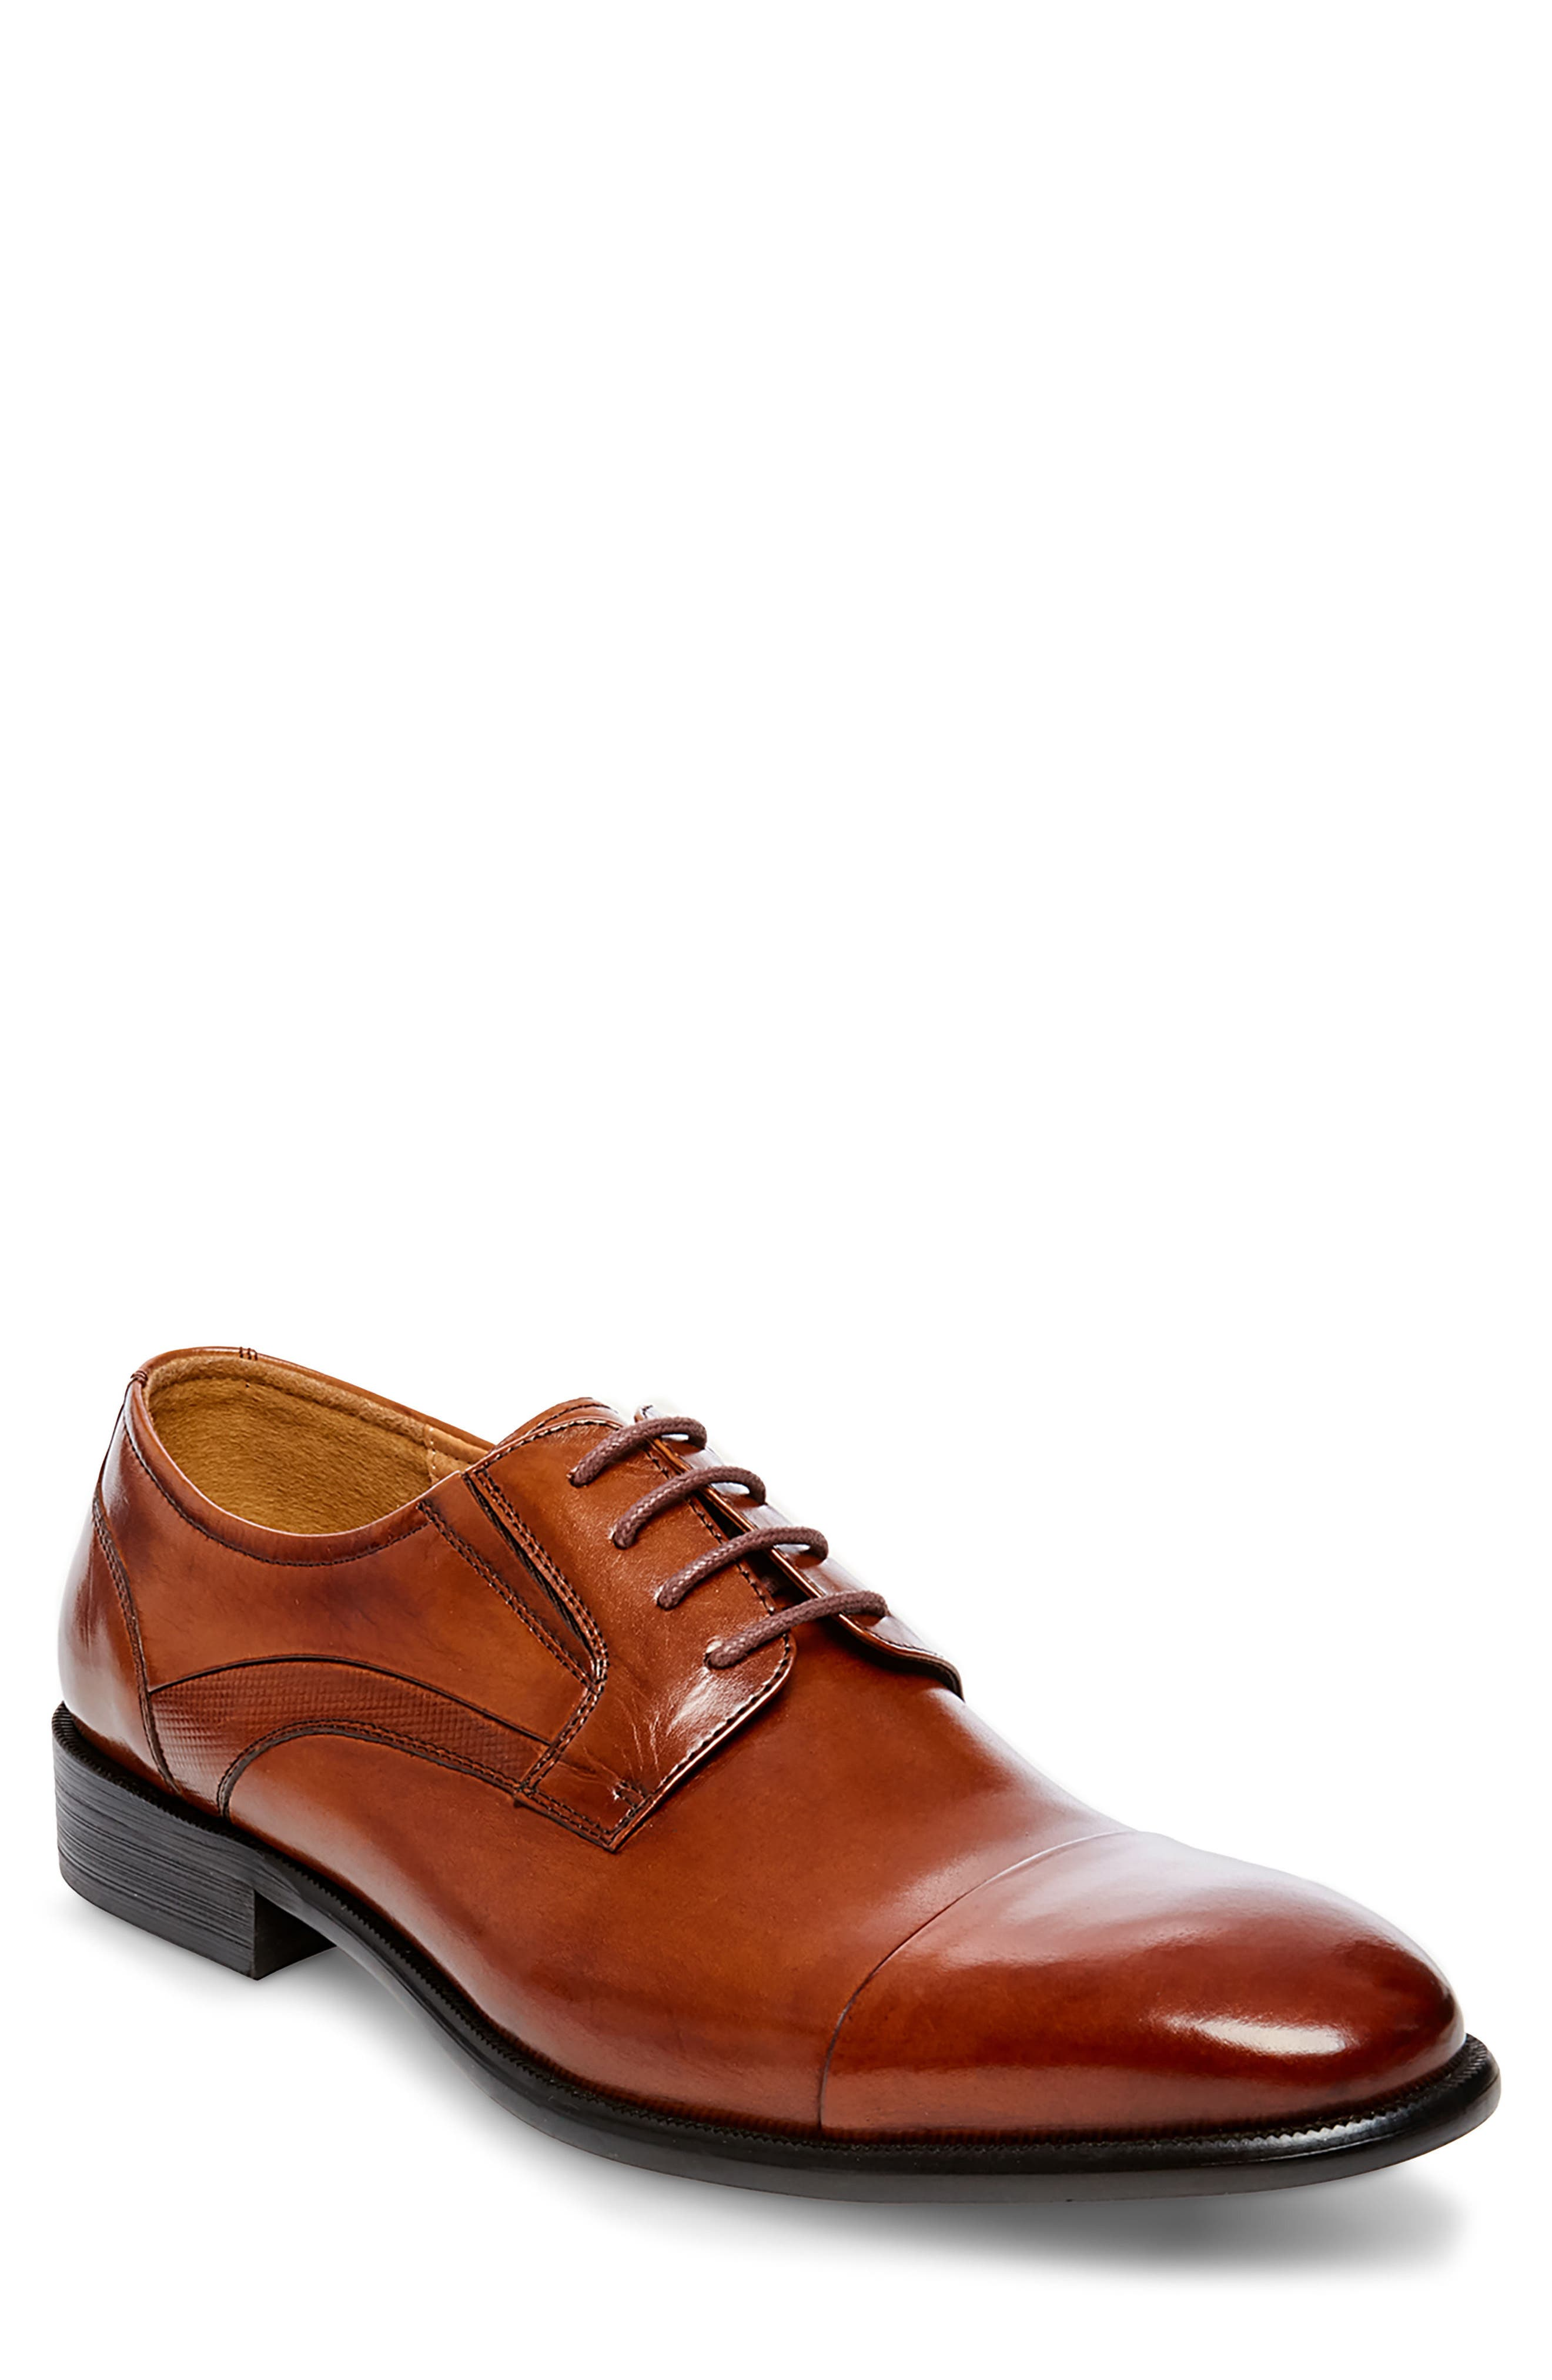 Carlo Cap Toe Derby,                         Main,                         color, Tan Leather